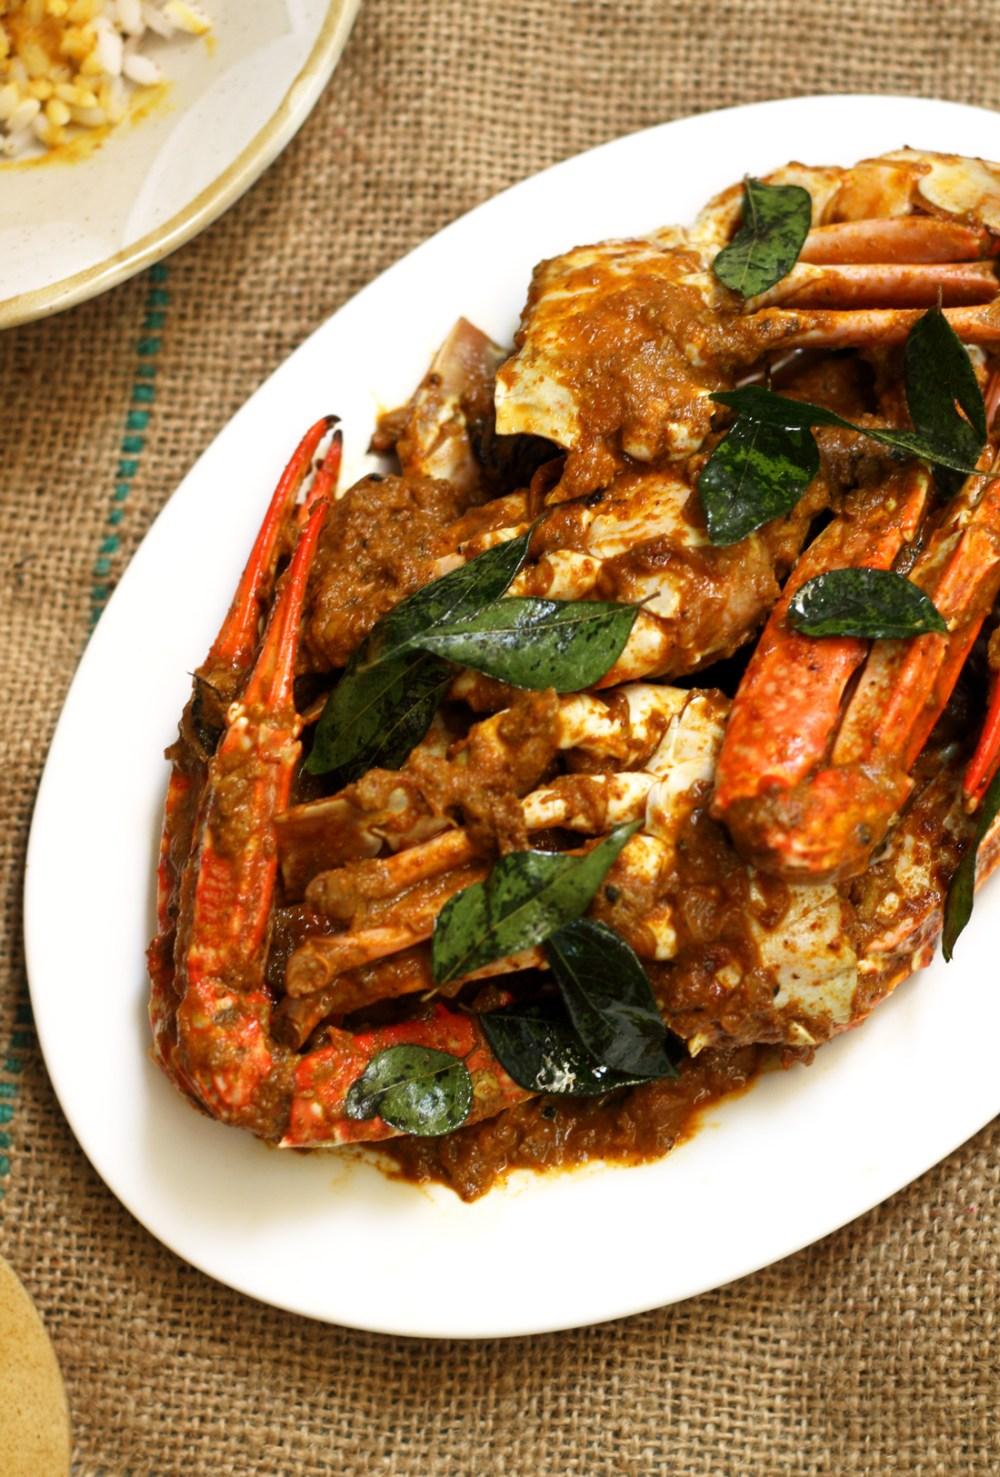 Nadan Crab Roast or Nchandu Ularthiyathu